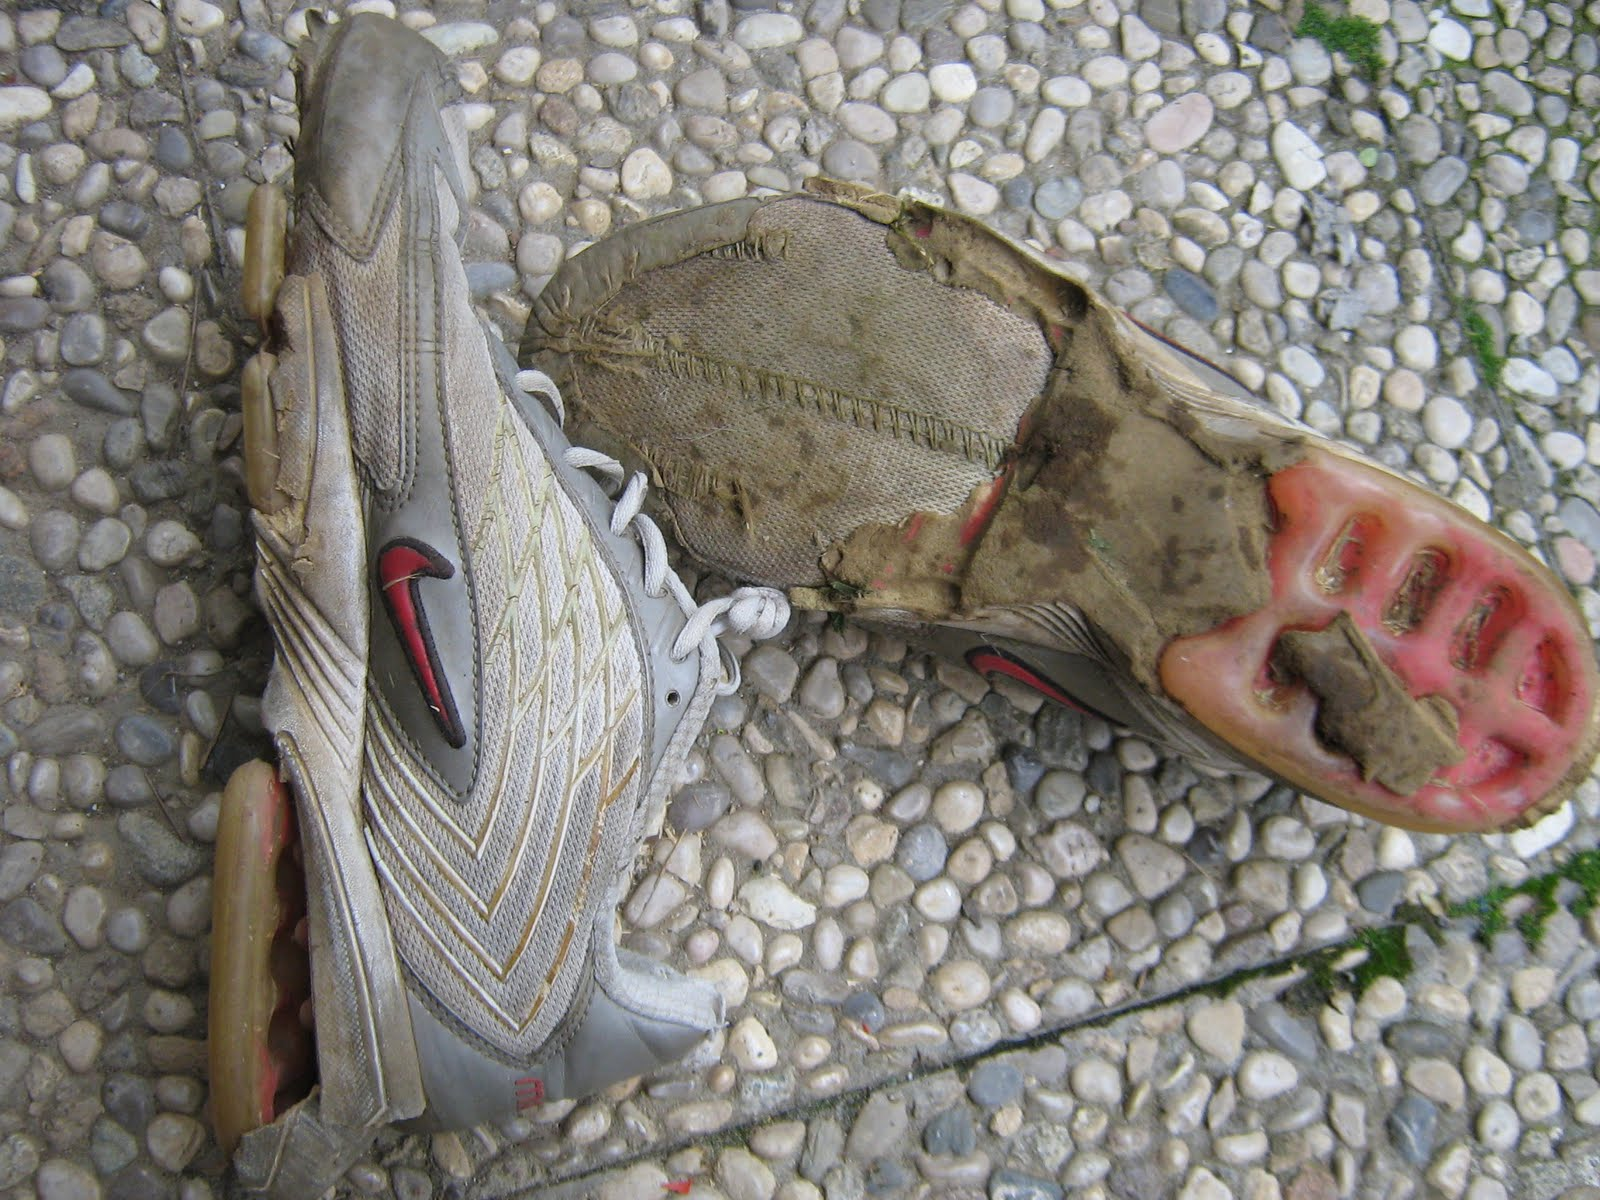 new arrival 5a283 72359 El bebecius: non ci sono piu' le scarpe di una volta